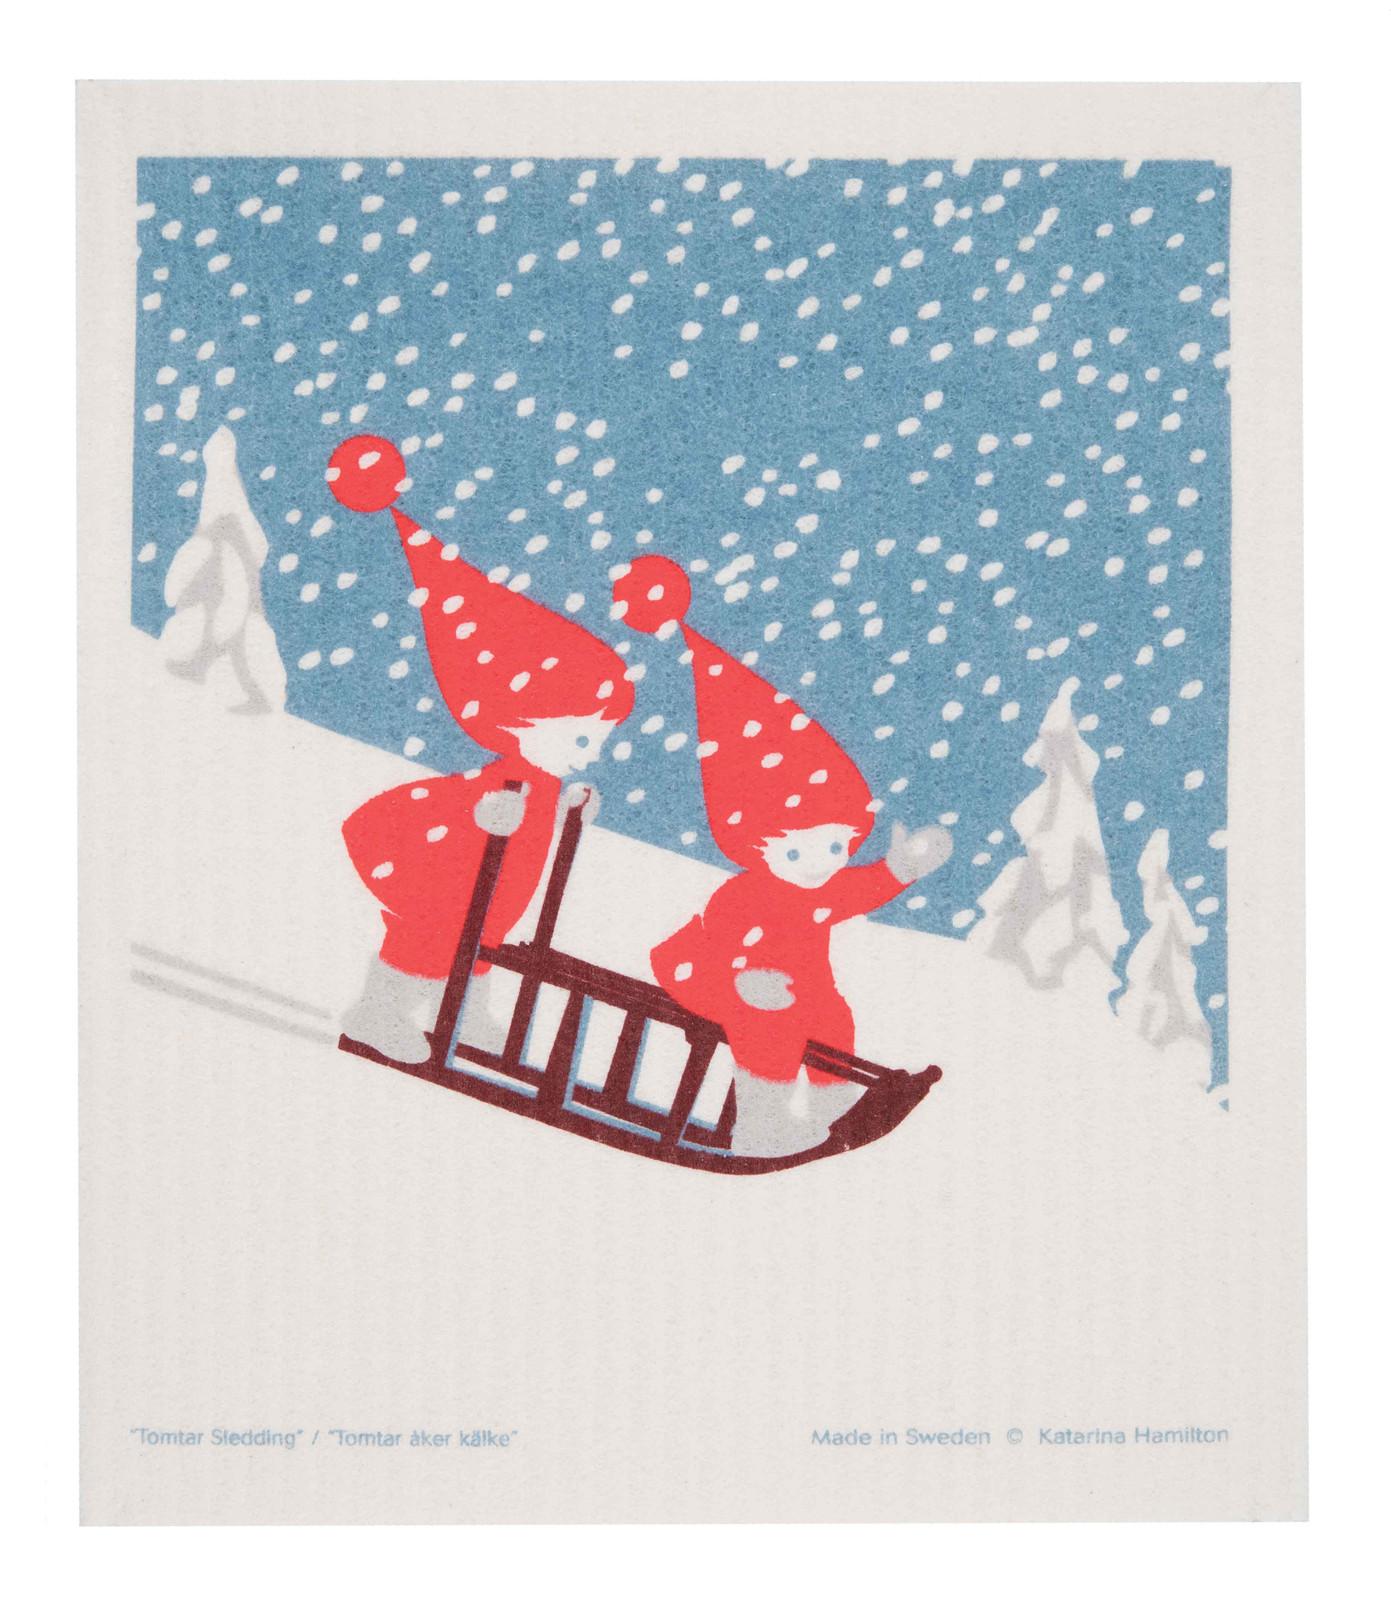 Swedish Christmas Dishcloth - Sledding Tomte